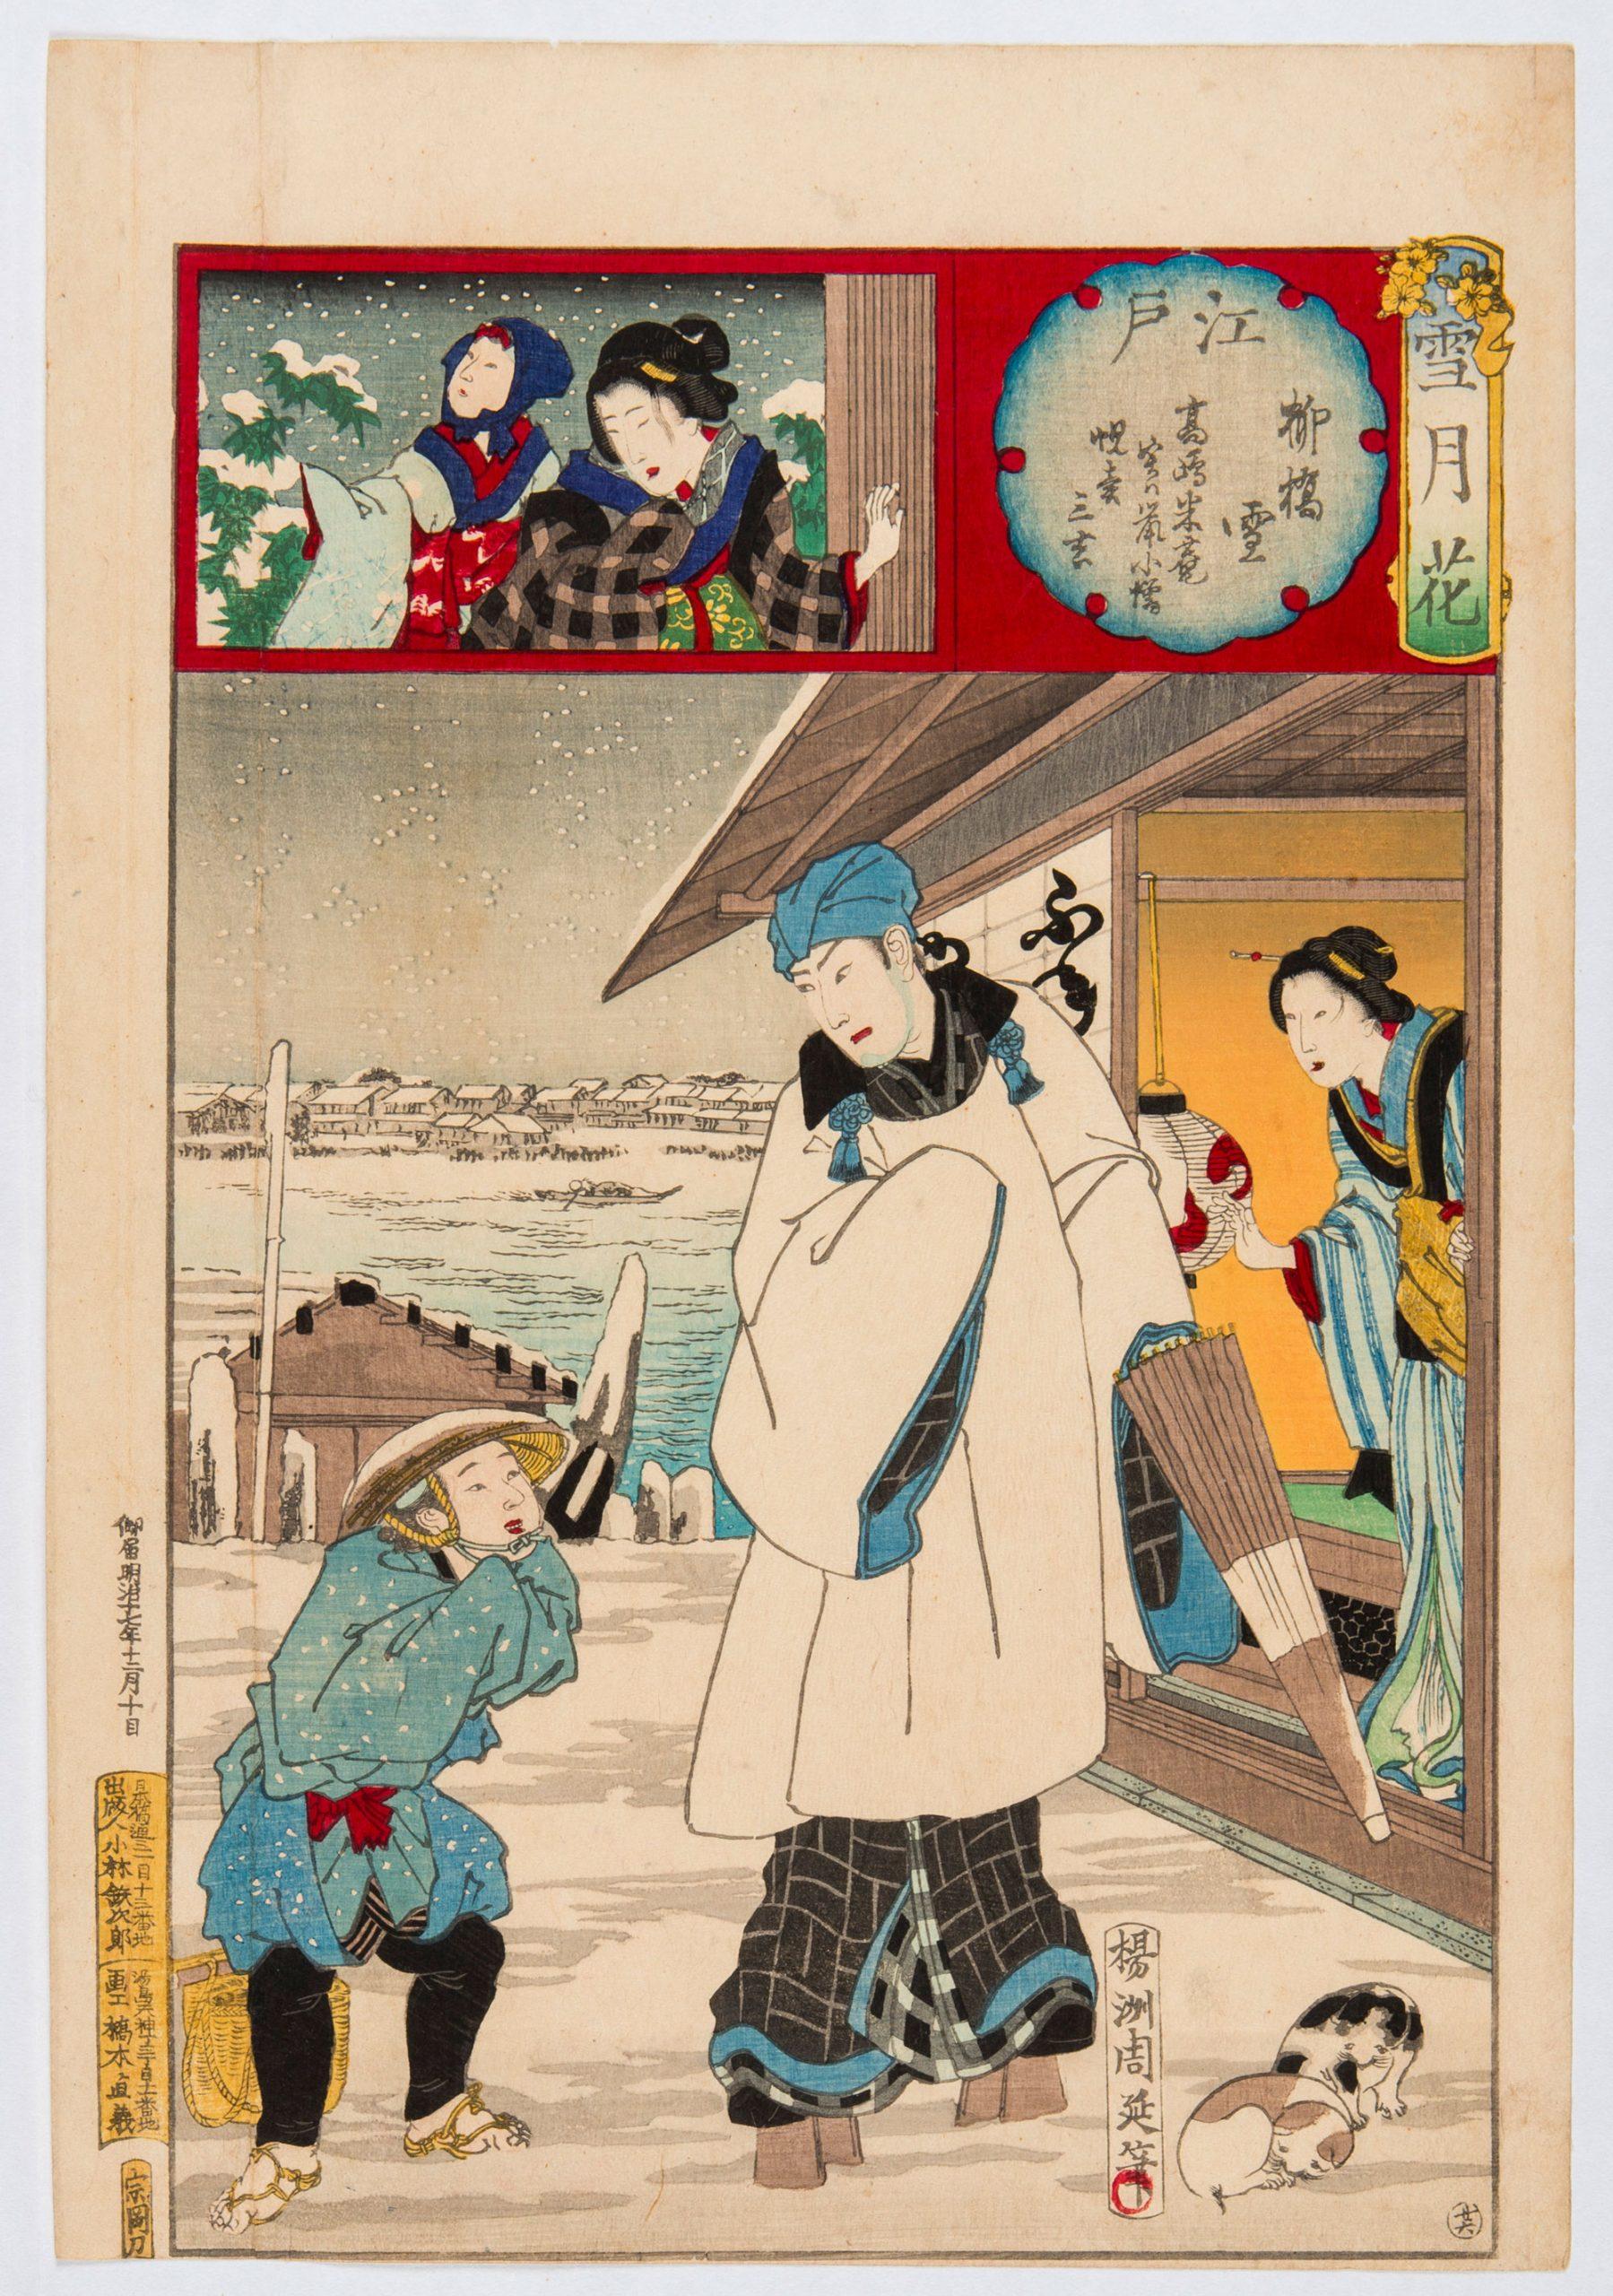 A man looks upon a frightened boy at Yanagi Bridge